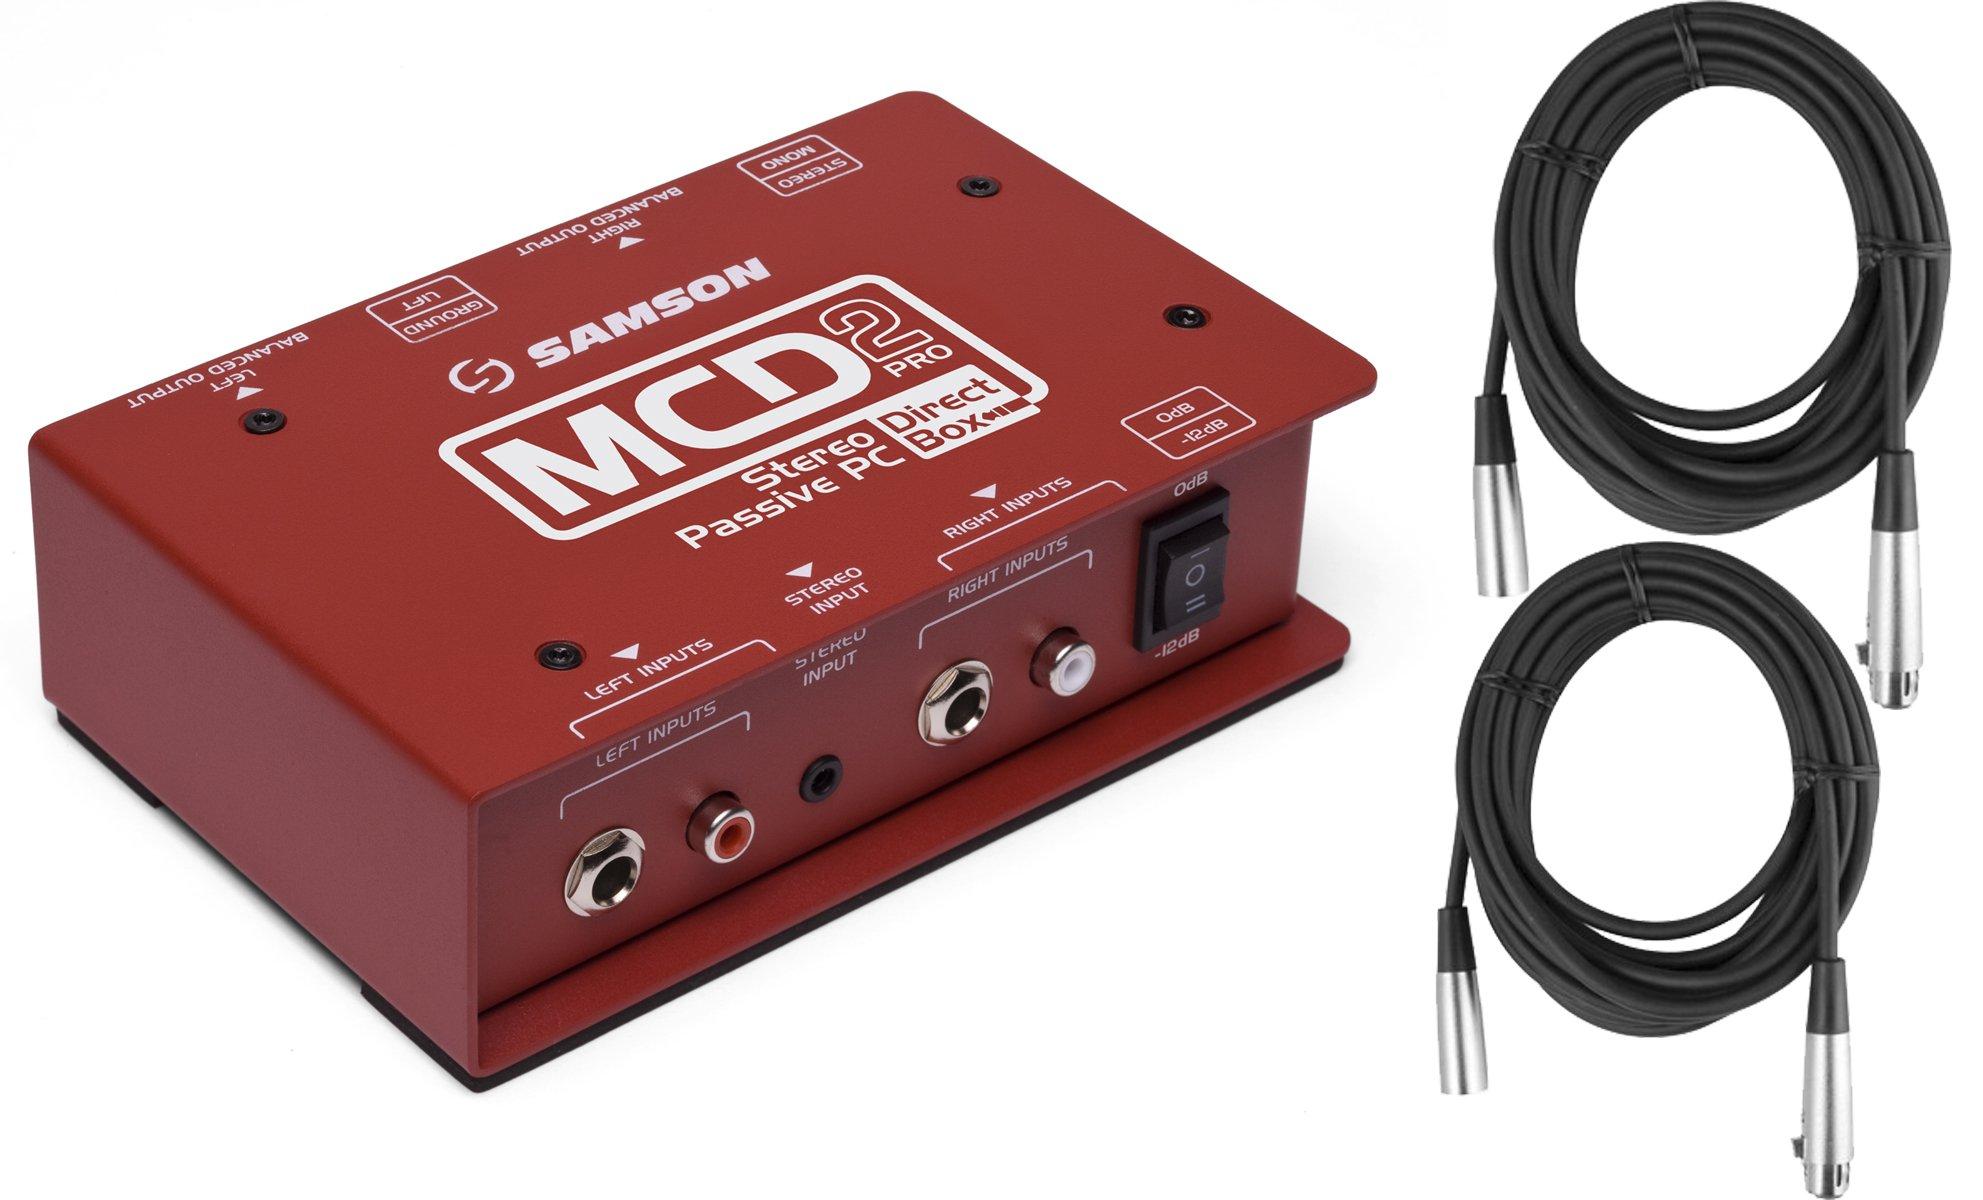 Samson MCD2 PRO Professional Stereo Computer/DJ Direct Box (Shielded Transformer) w/ 2 XLR Cables